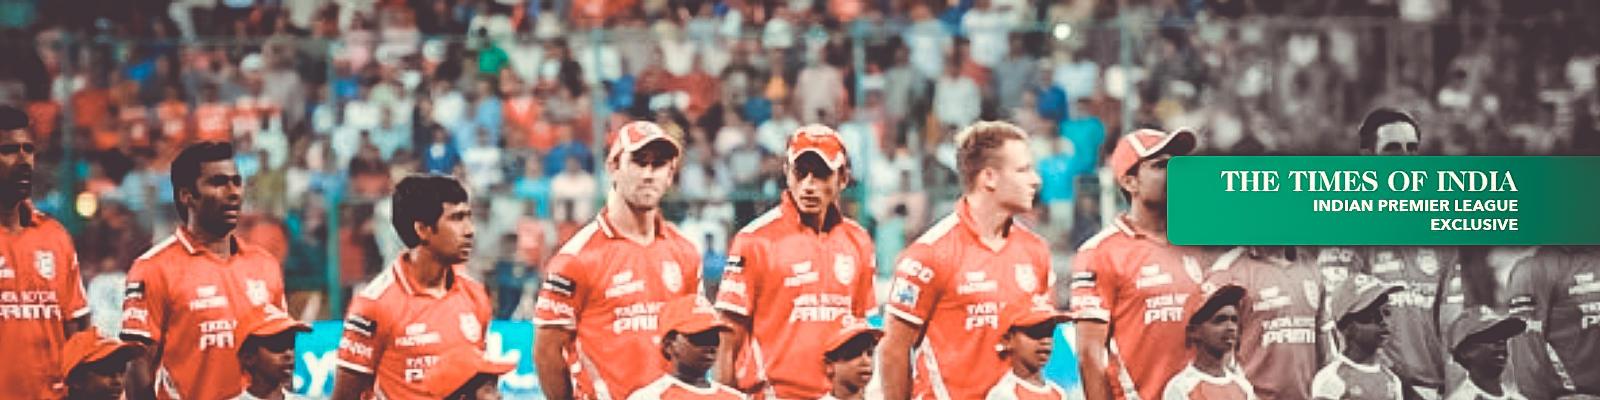 Teams with lowest winning margin by runs in IPL